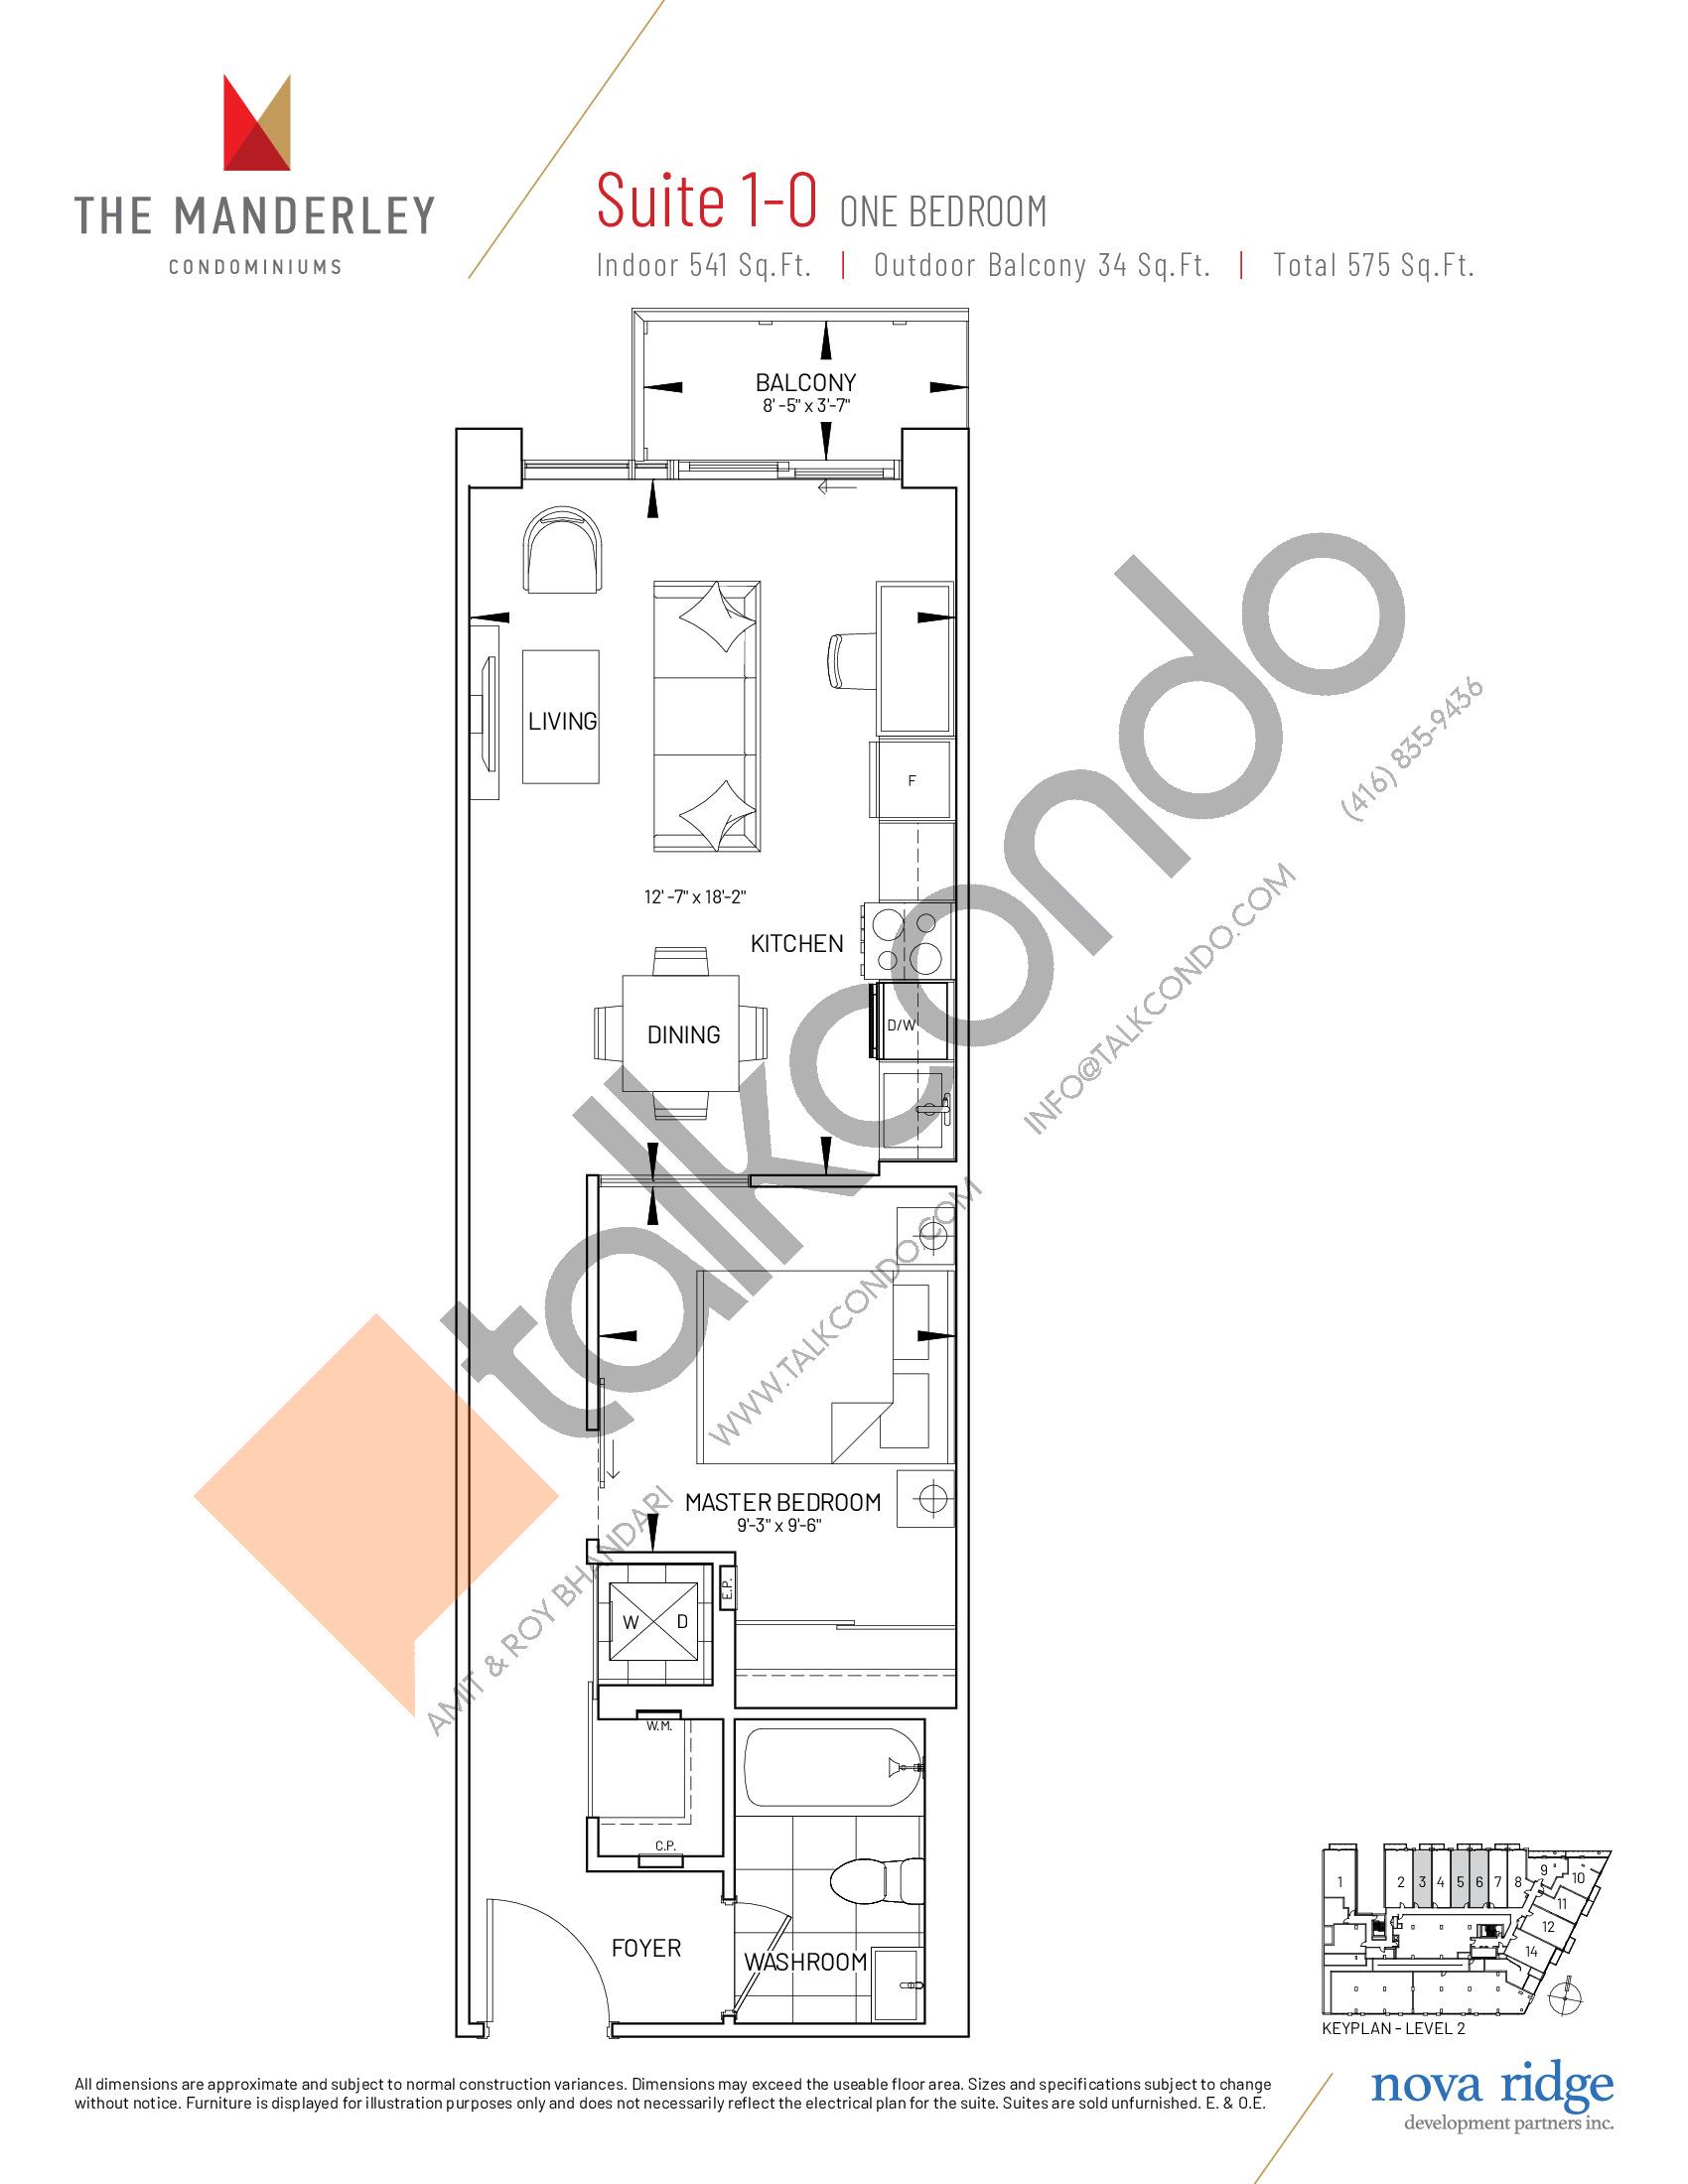 Suite 1-O Floor Plan at The Manderley Condos - 541 sq.ft